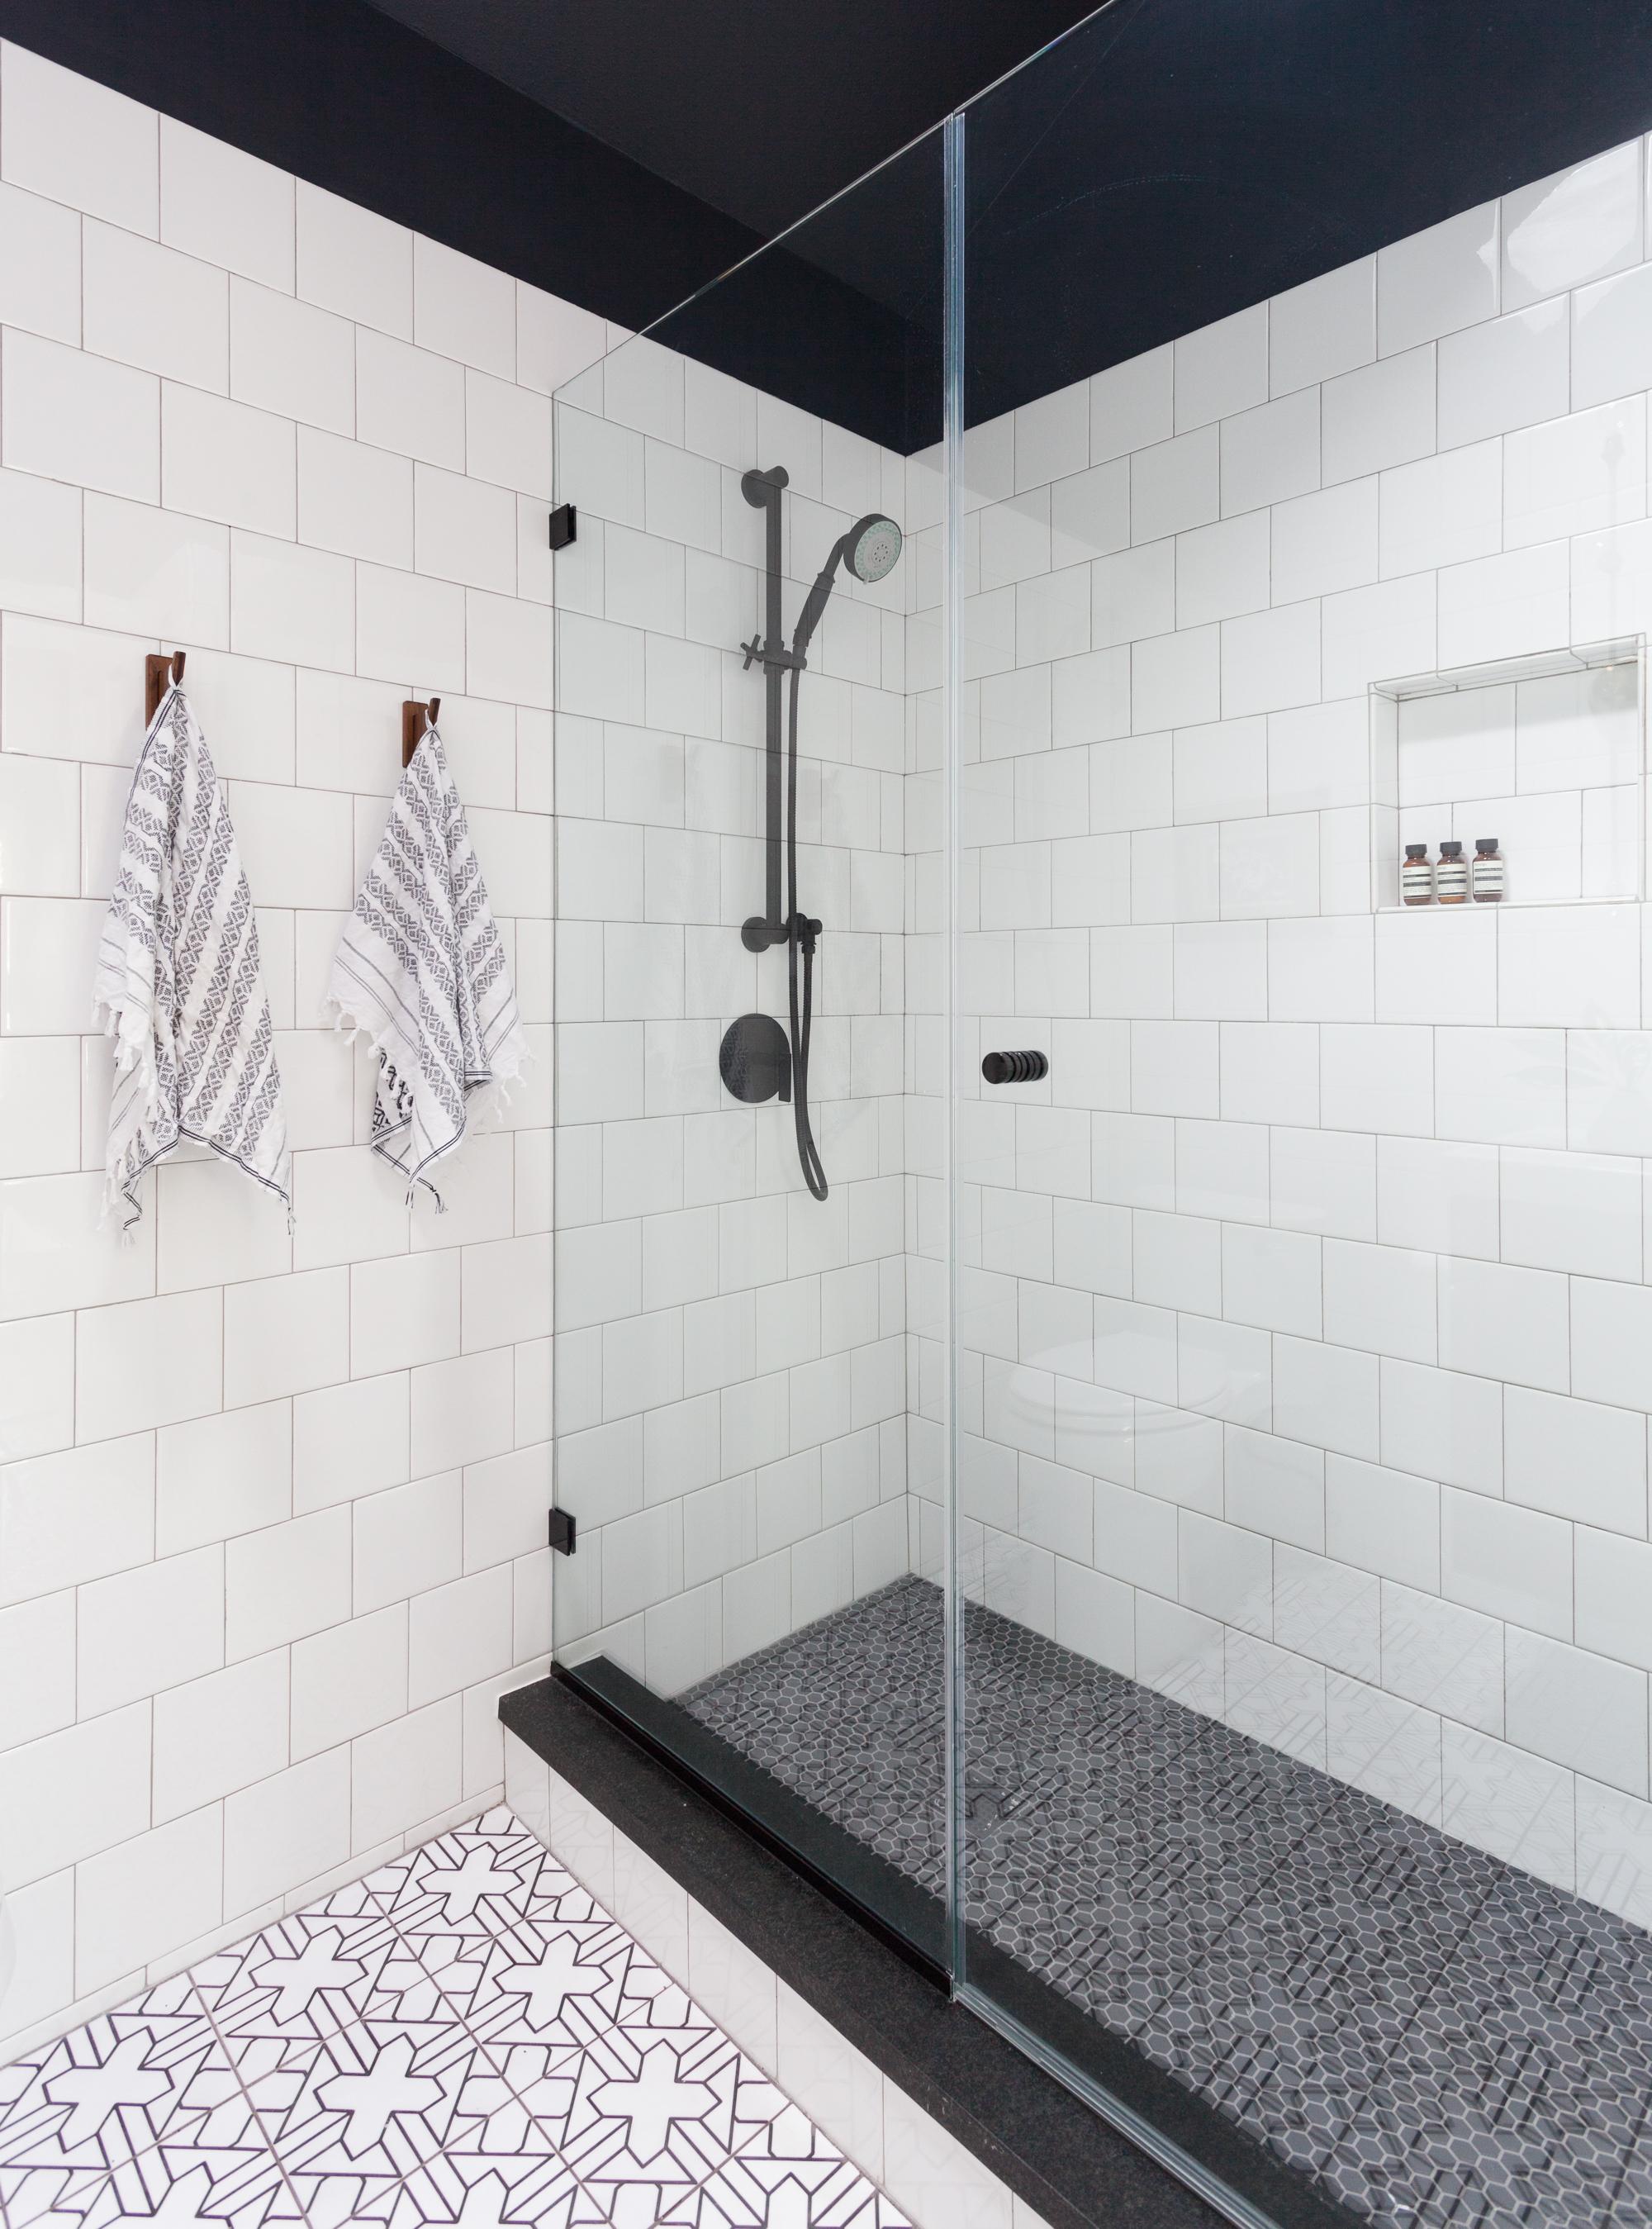 Bathroom Wall Tiles Brisbane: Tile School: Bathroom Wall Tile Height, How High